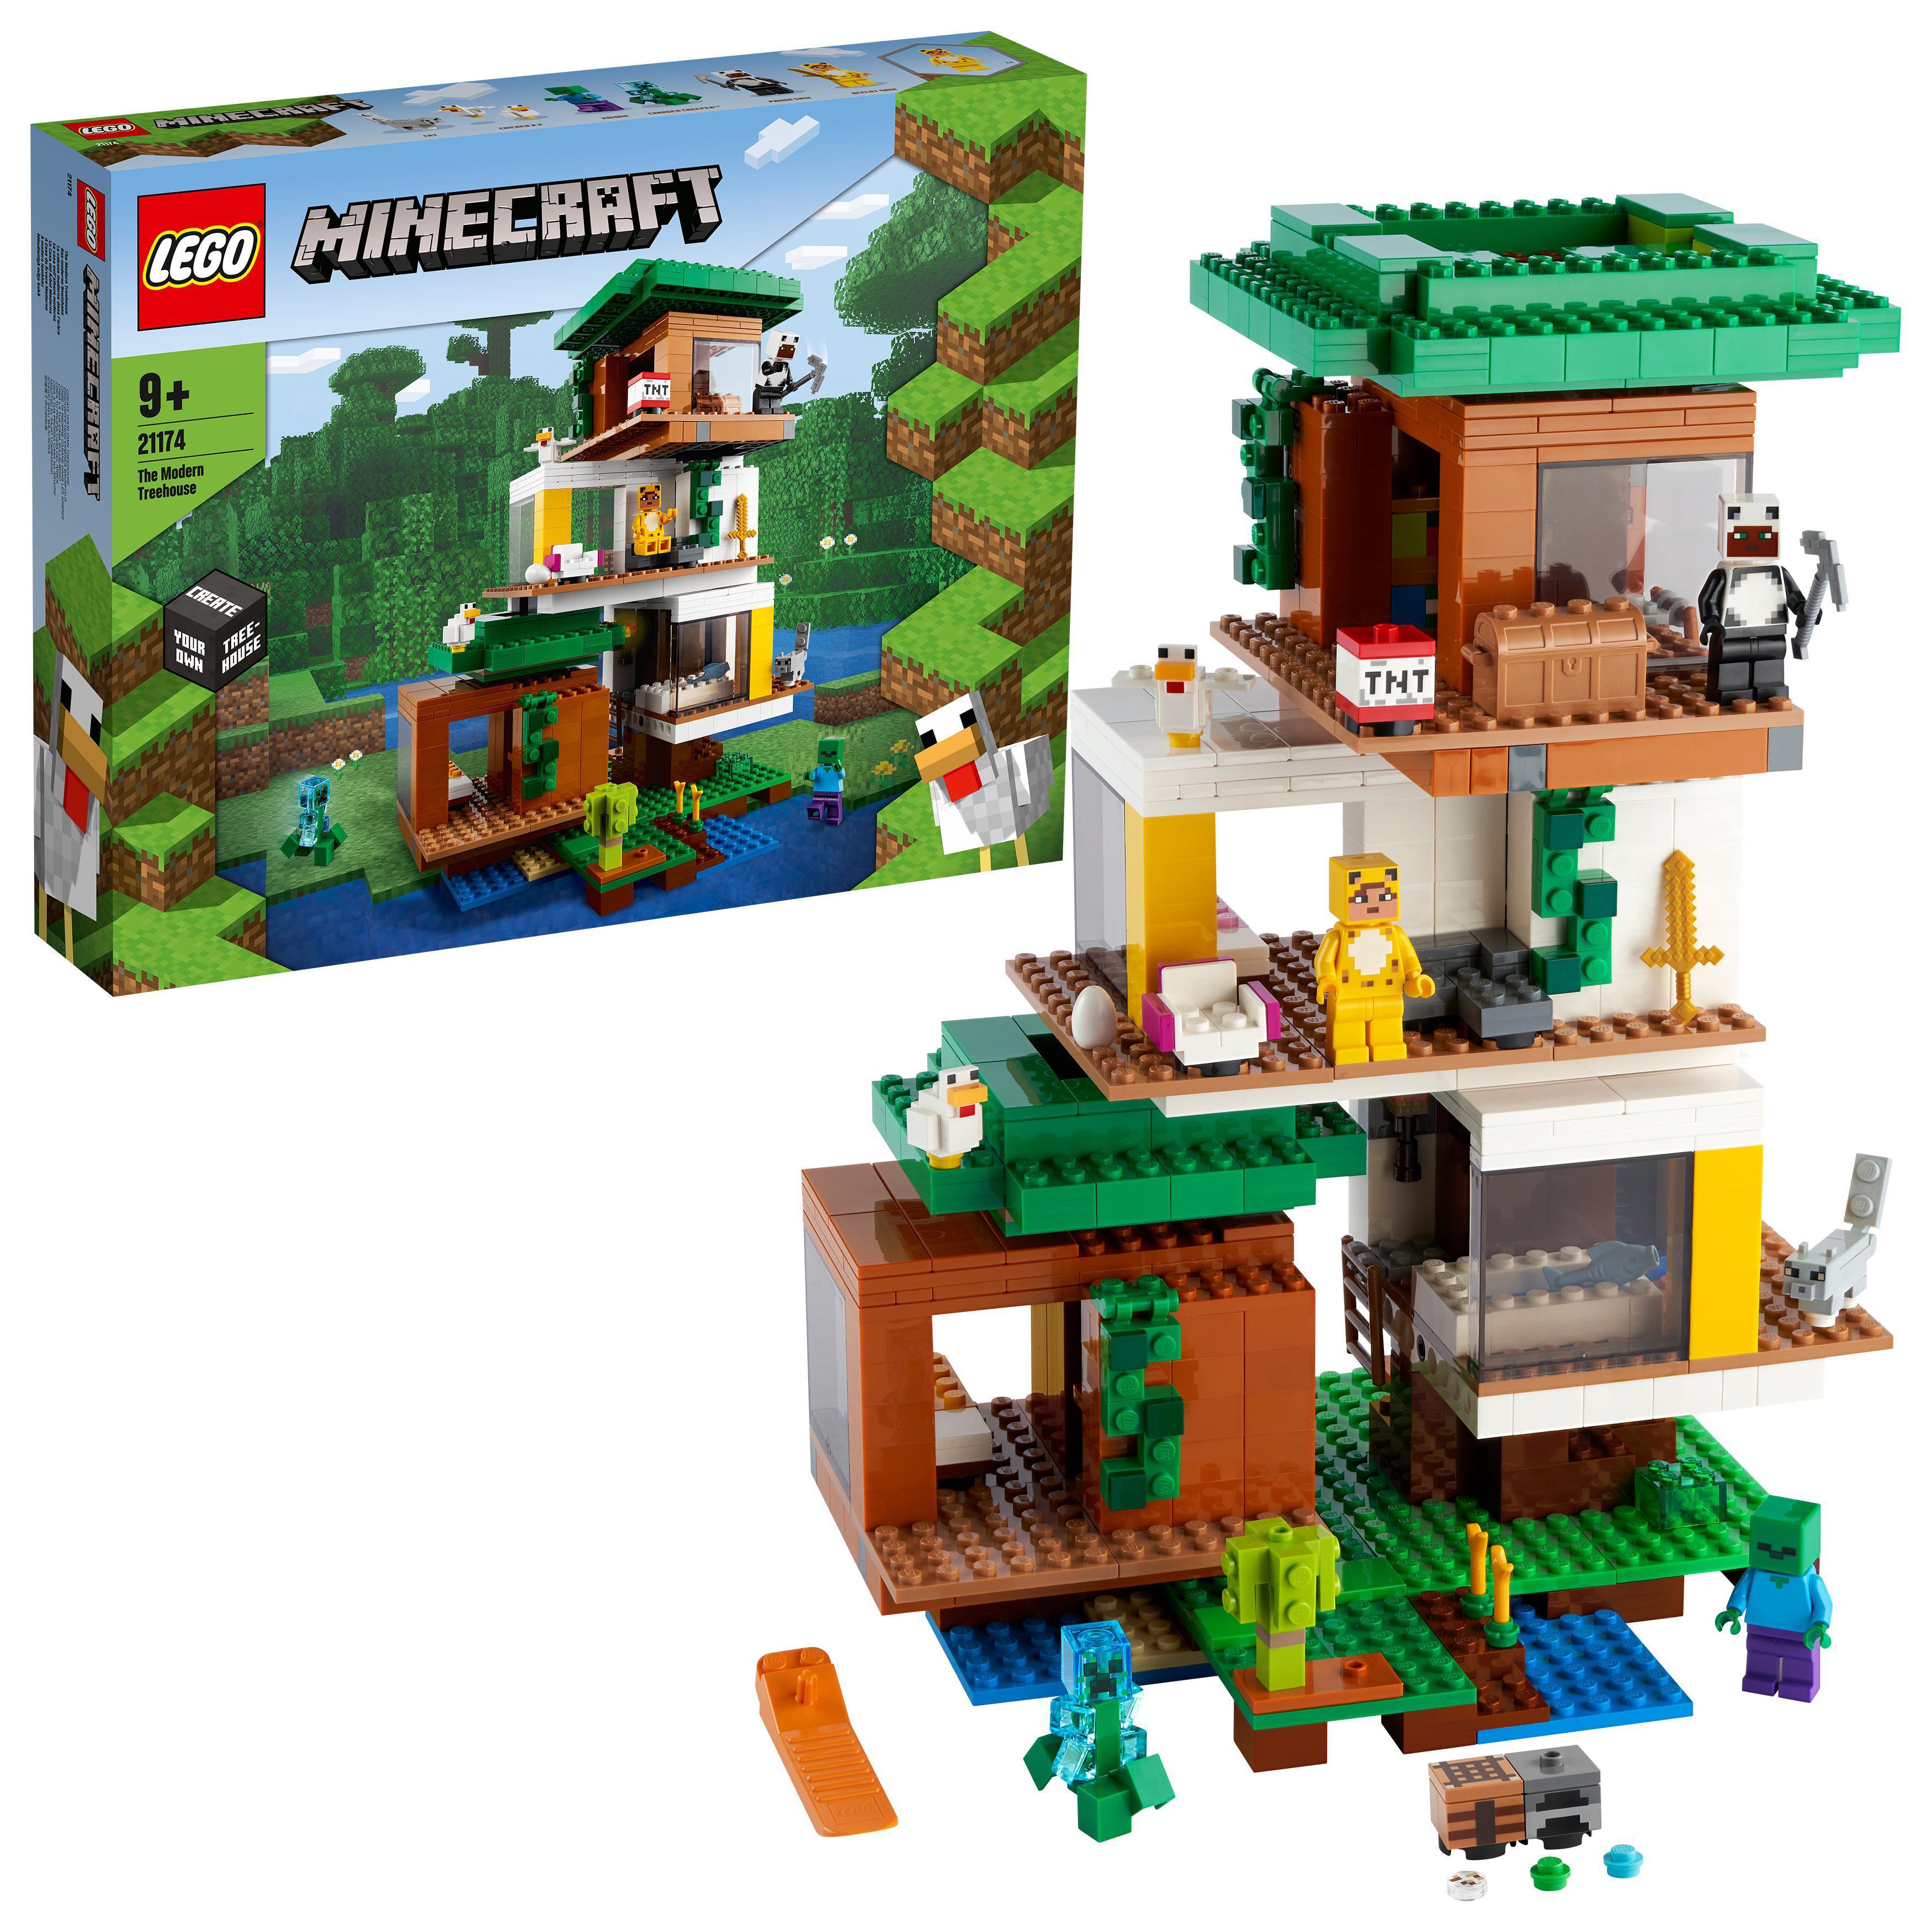 LEGO Minecraft - The Modern Treehouse (21174)